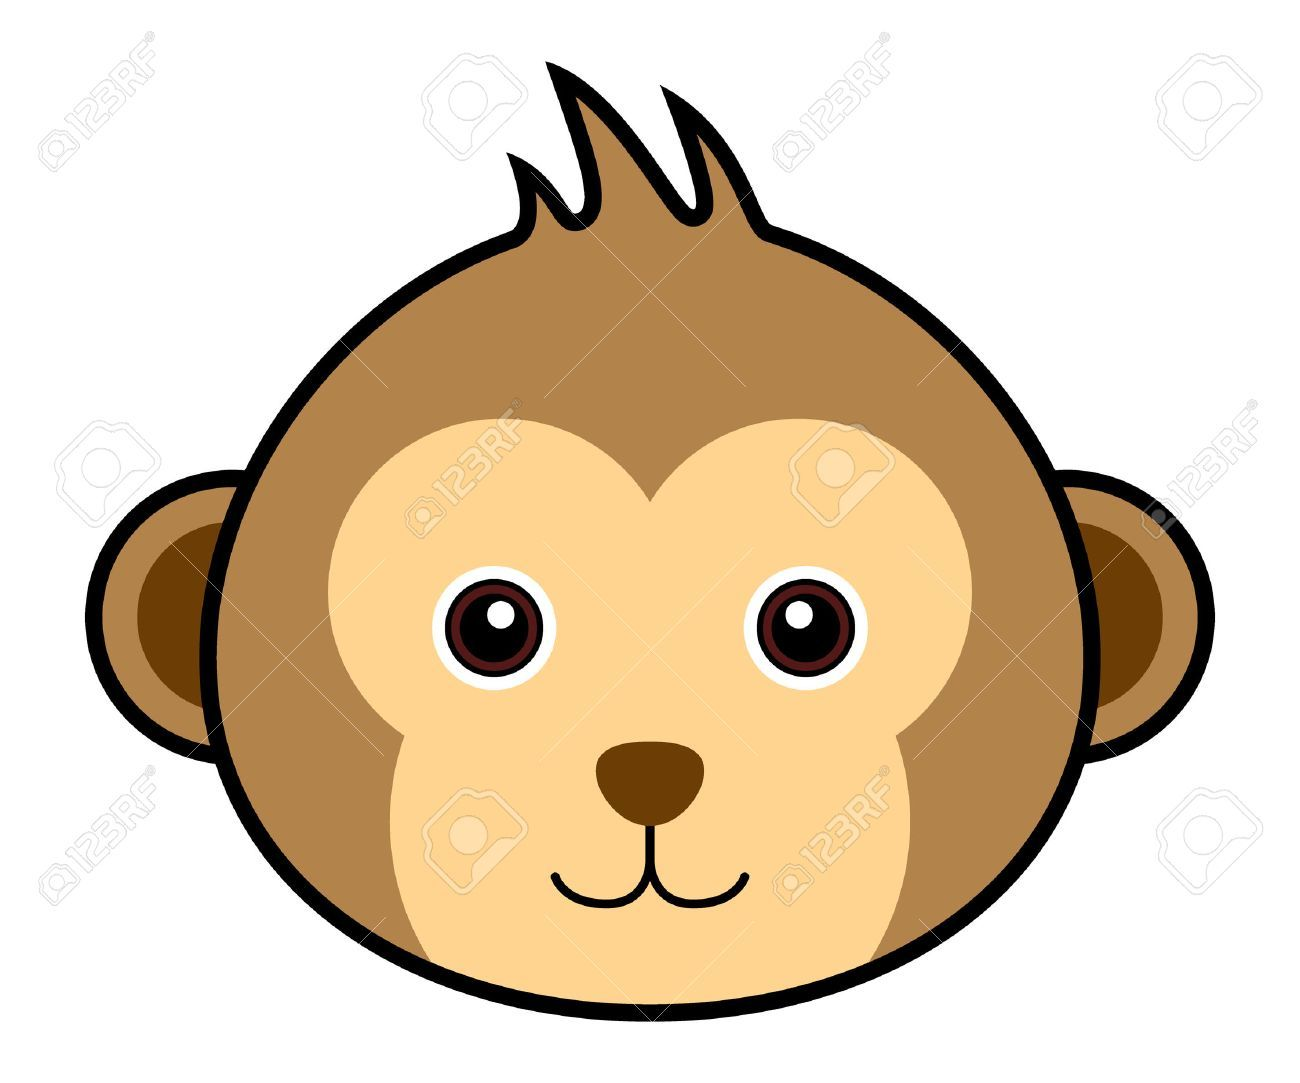 Monkey head clipart 3 » Clipart Portal.